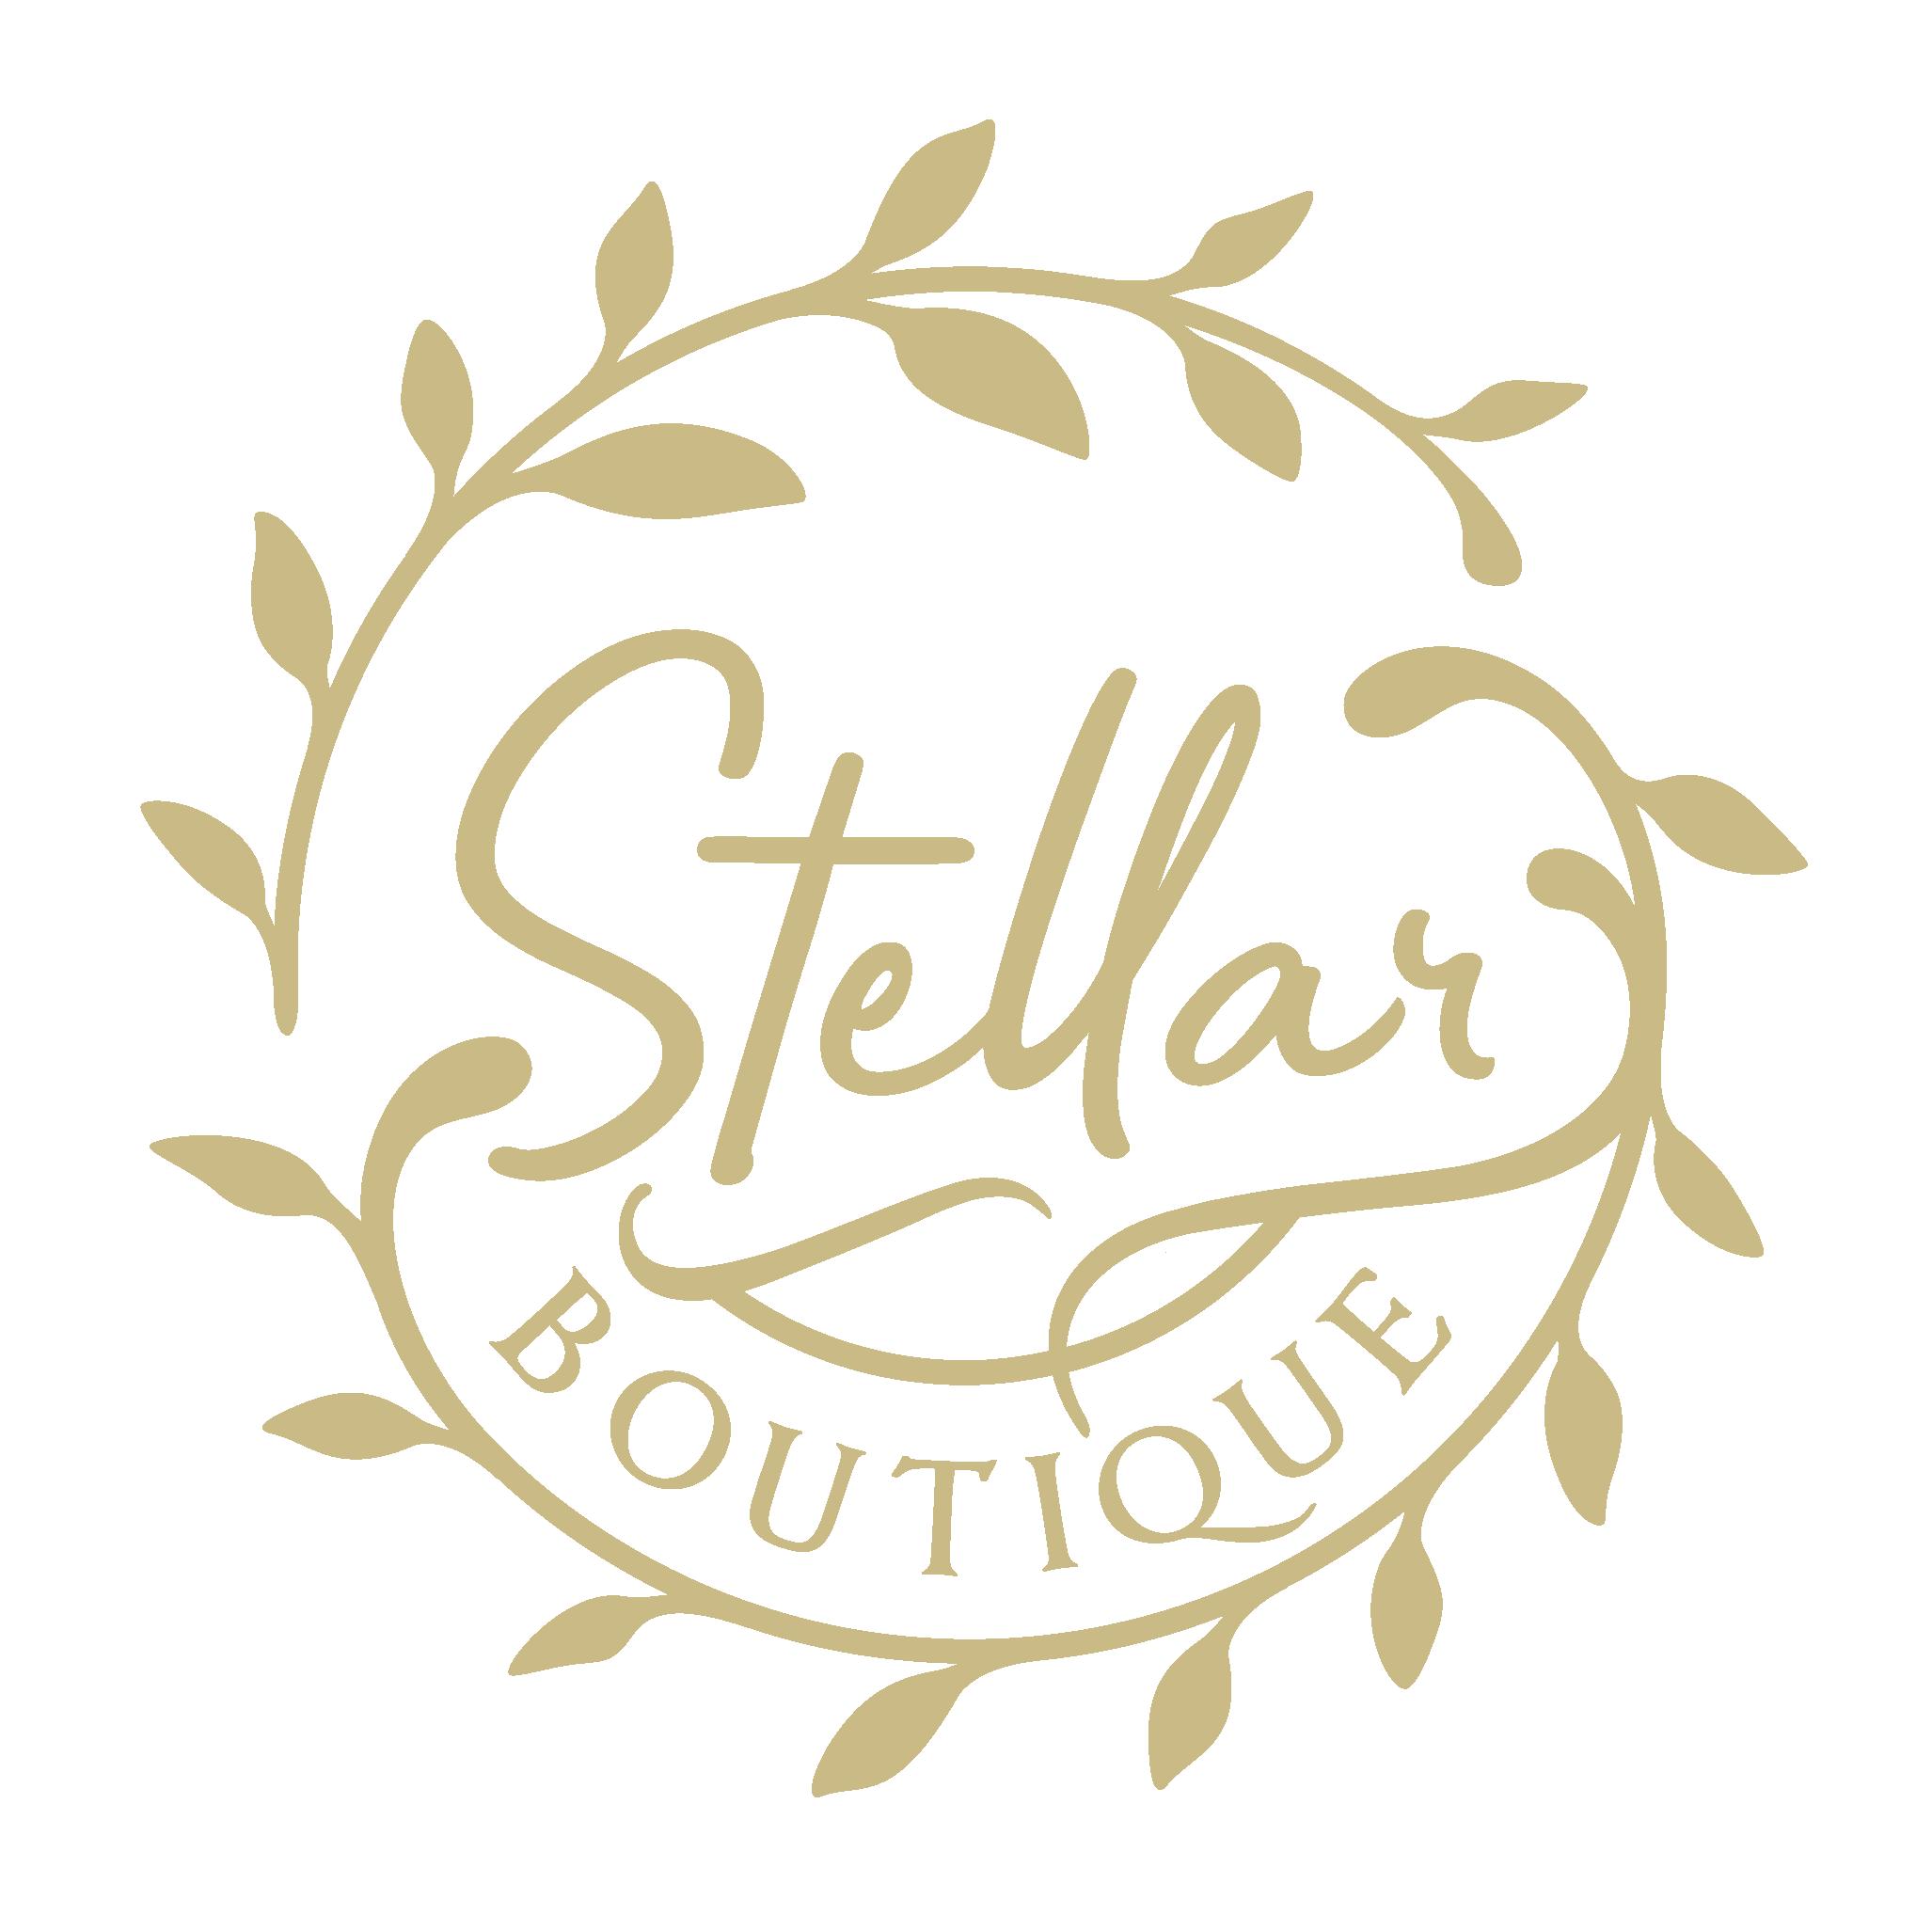 StellarBoutique_RGB_MasterLogo.png